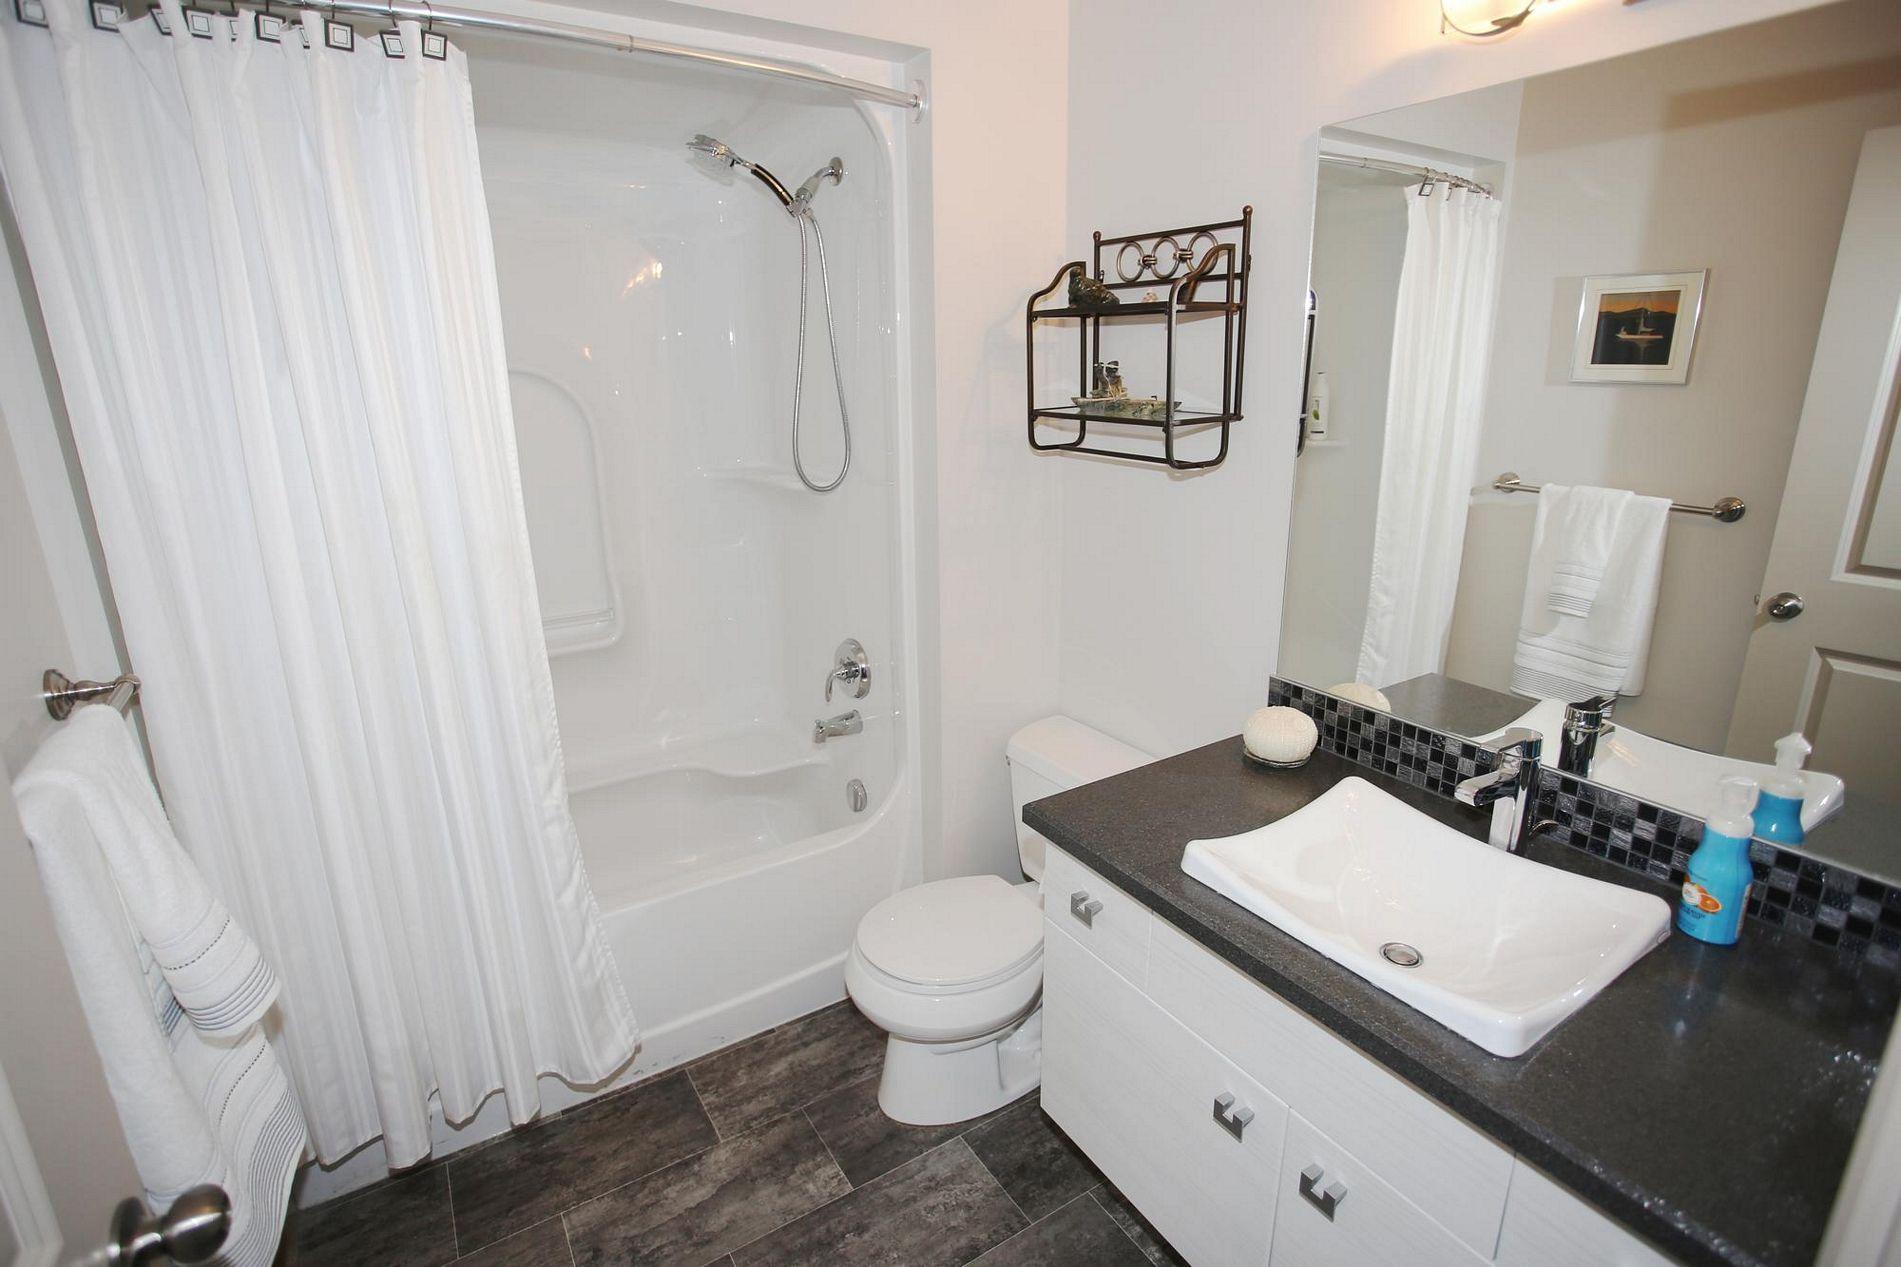 26 Edenwood Place, Winnipeg, Manitoba  R3X 0E4 - Photo 25 - 1831994